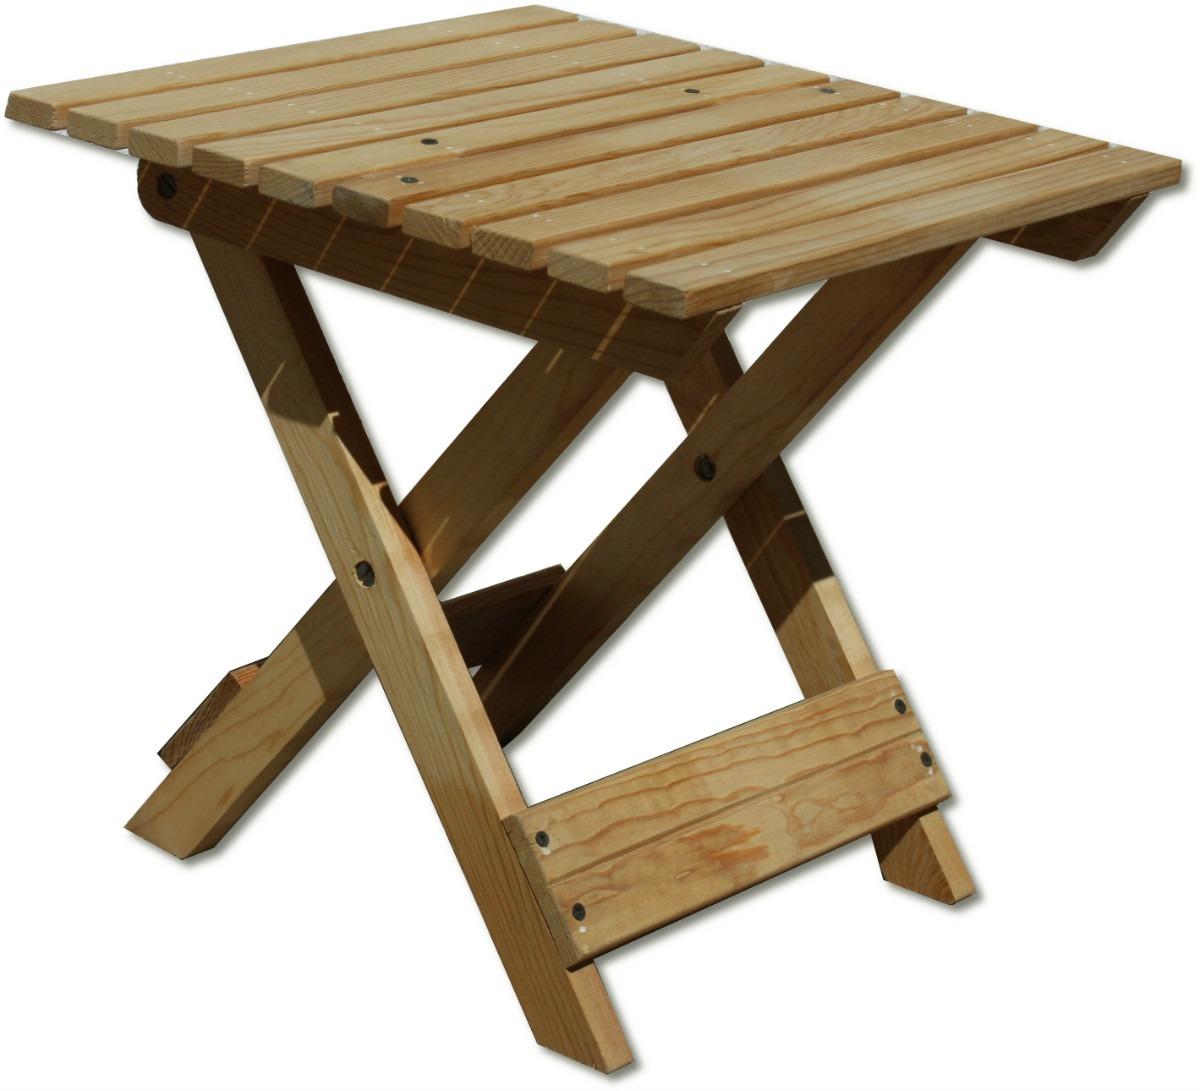 Banco de jard n mueble plegable madera jardin interiores for Mesa banco madera jardin